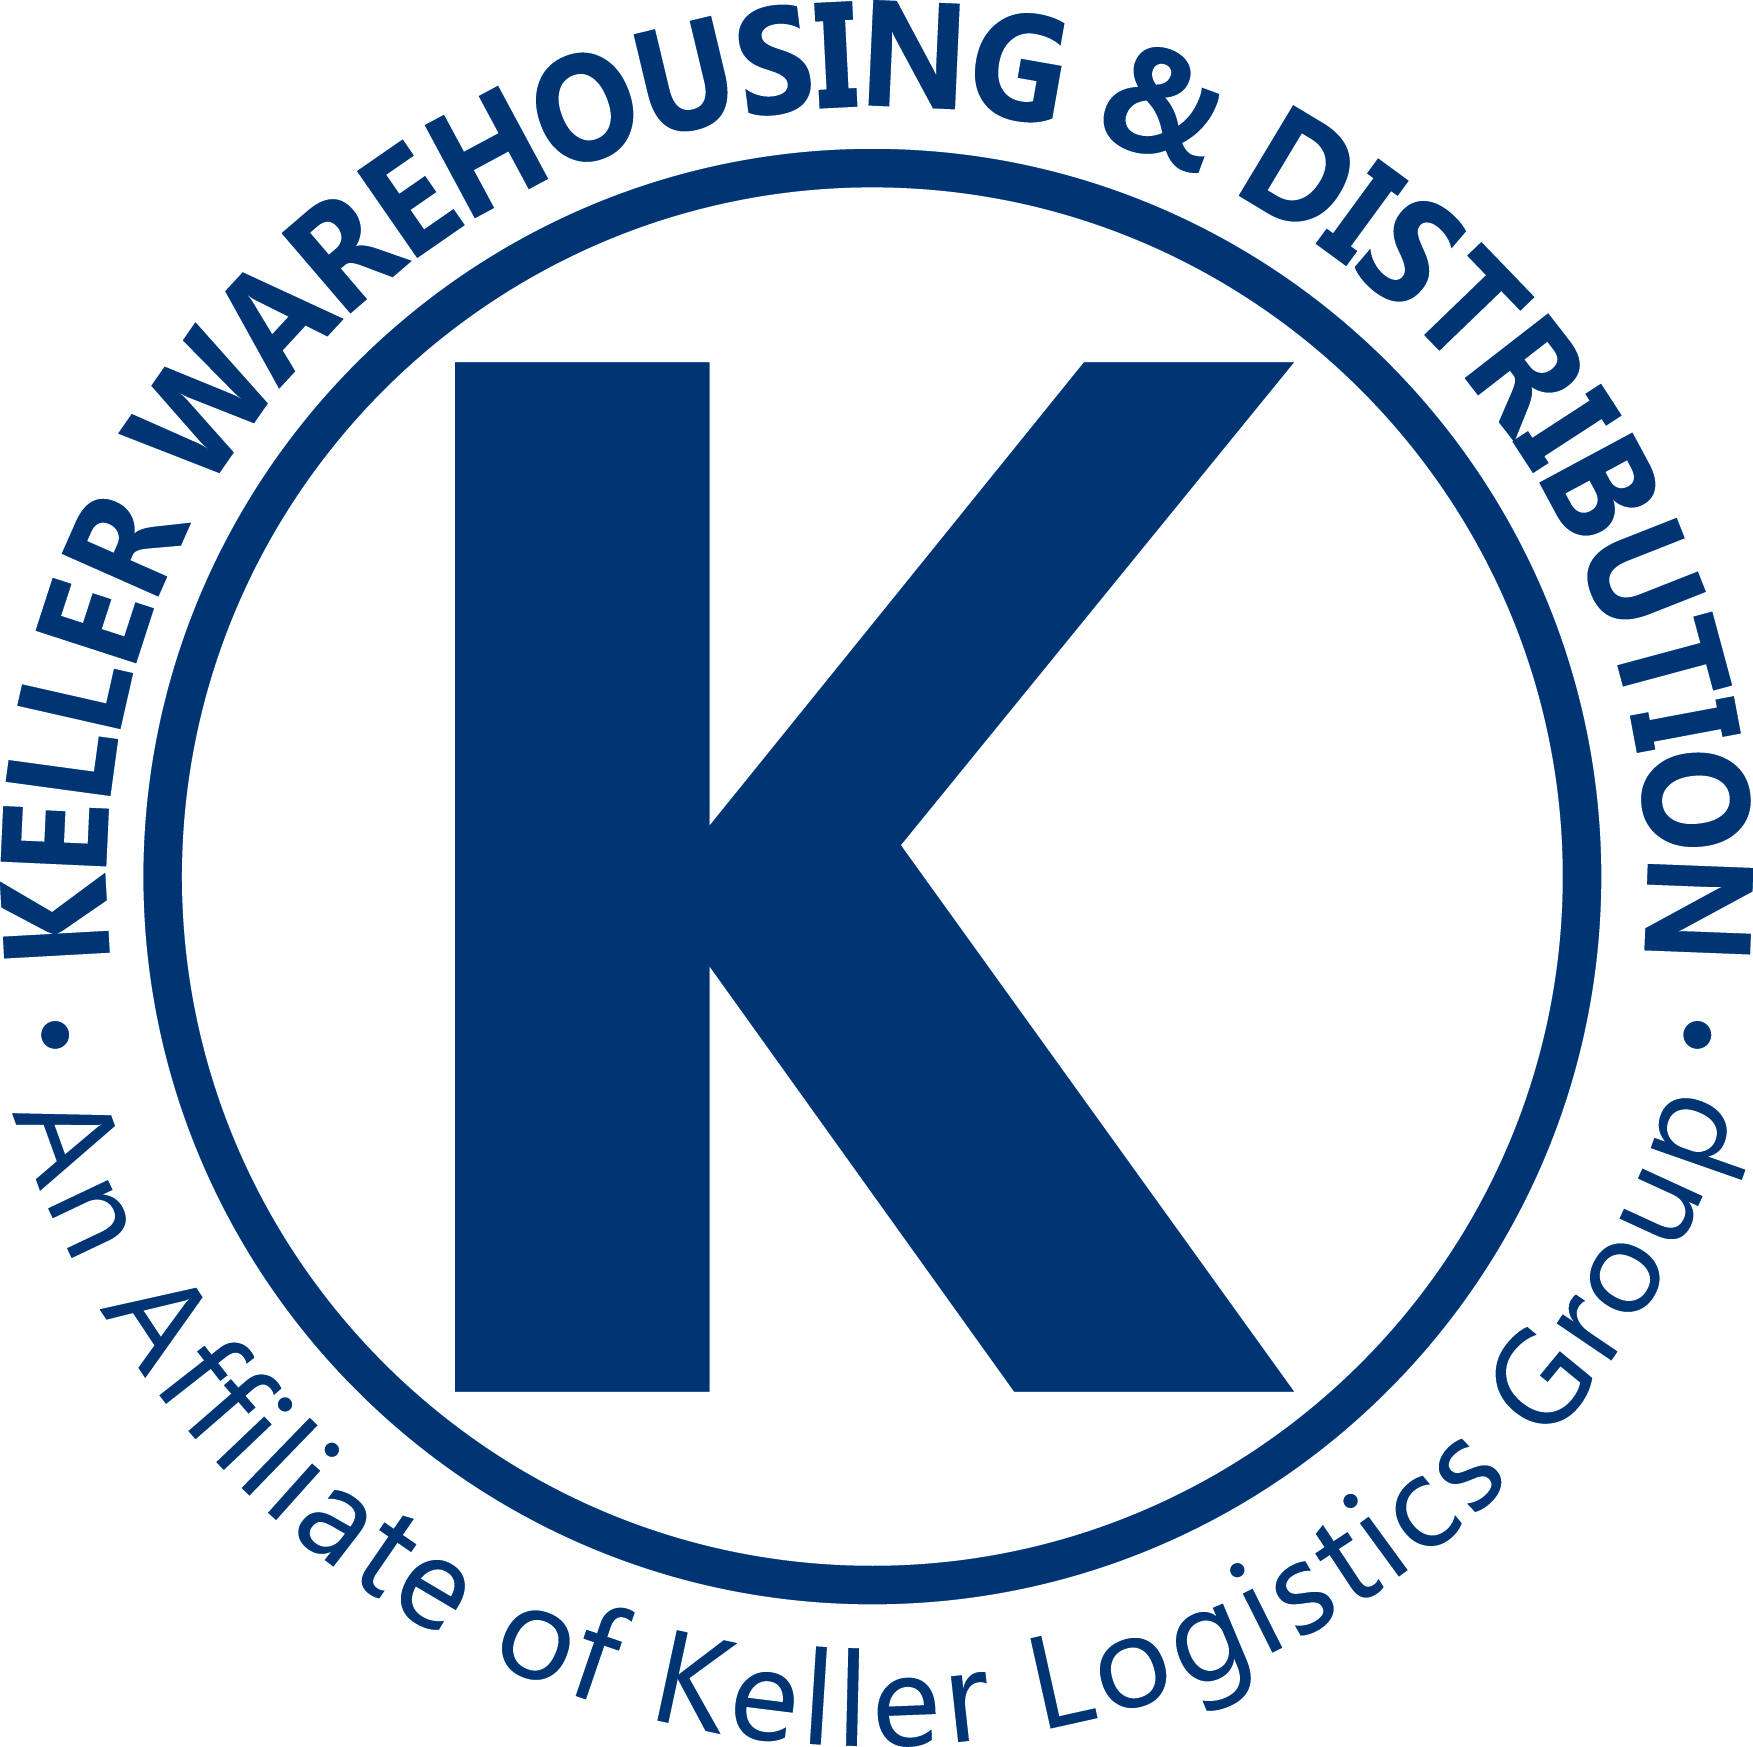 keller warehousing circle clr.jpg